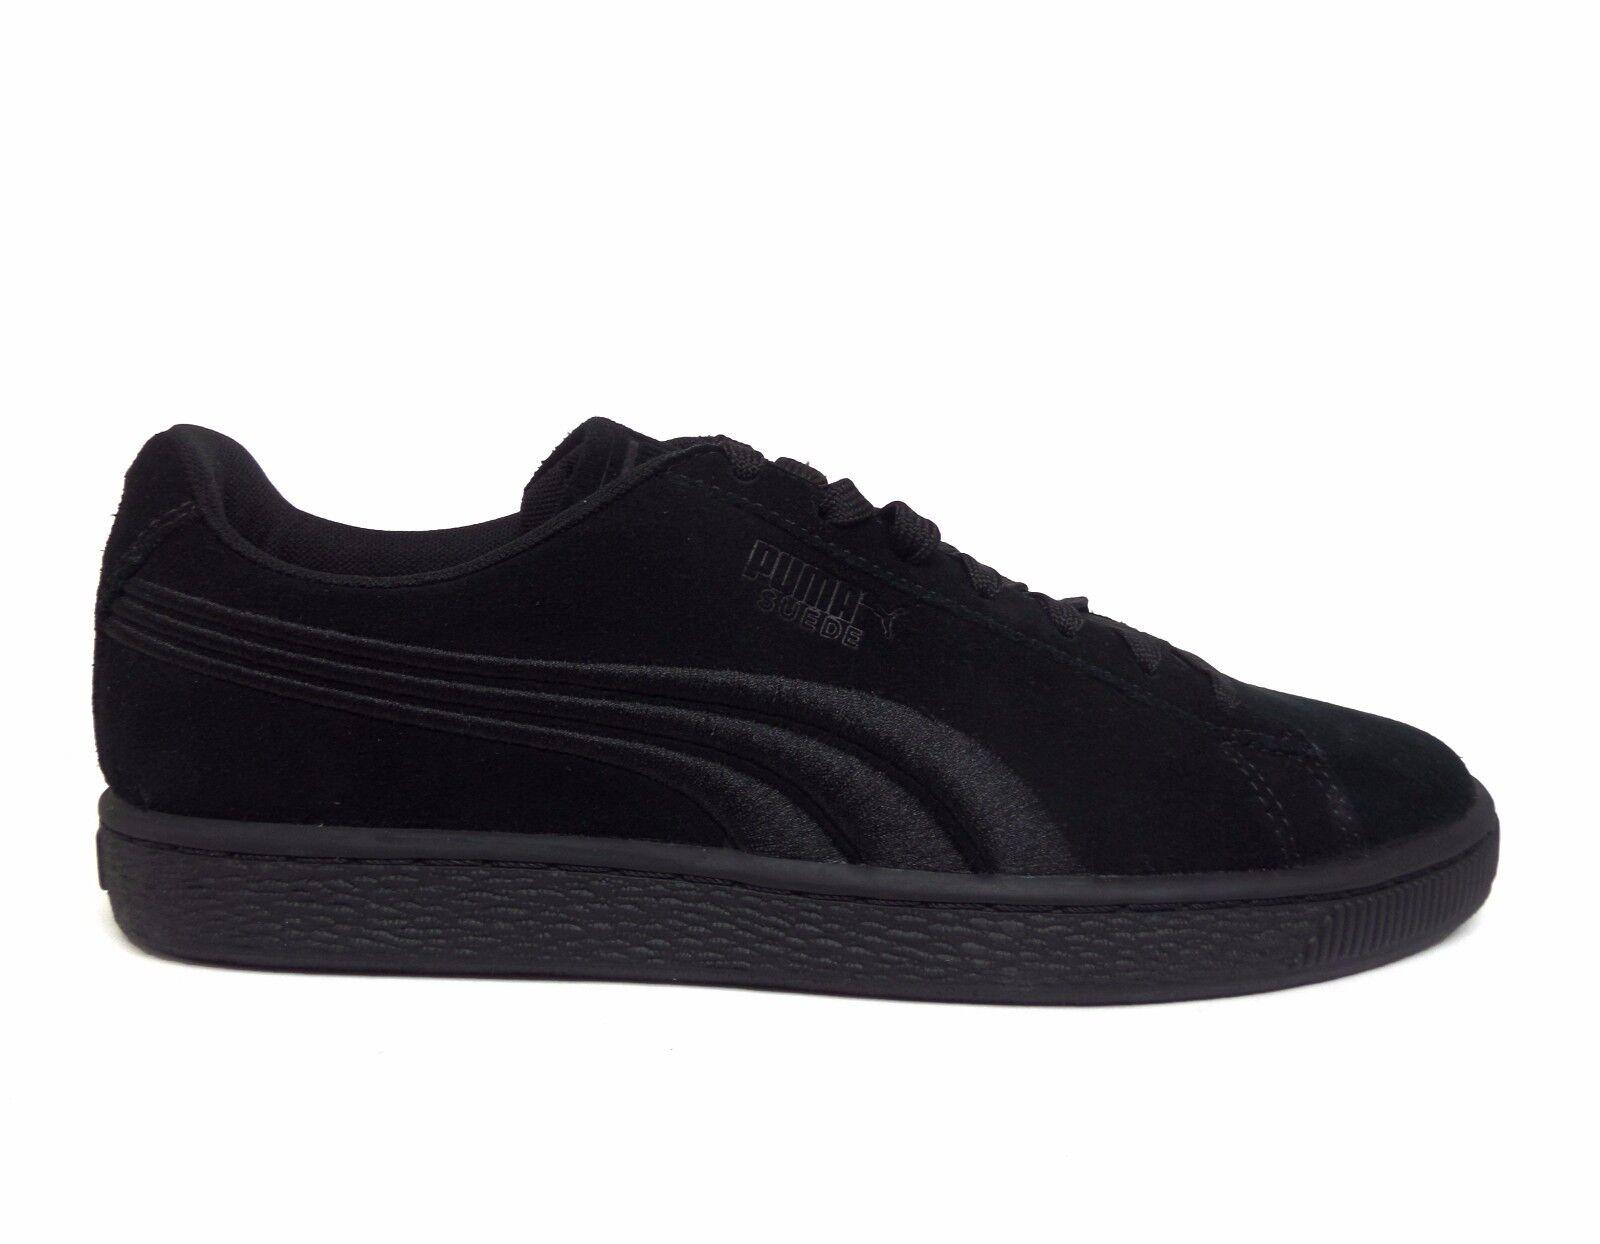 PUMA Men's SUEDE CLASSIC BADGE shoes Black Black 362594-01 b